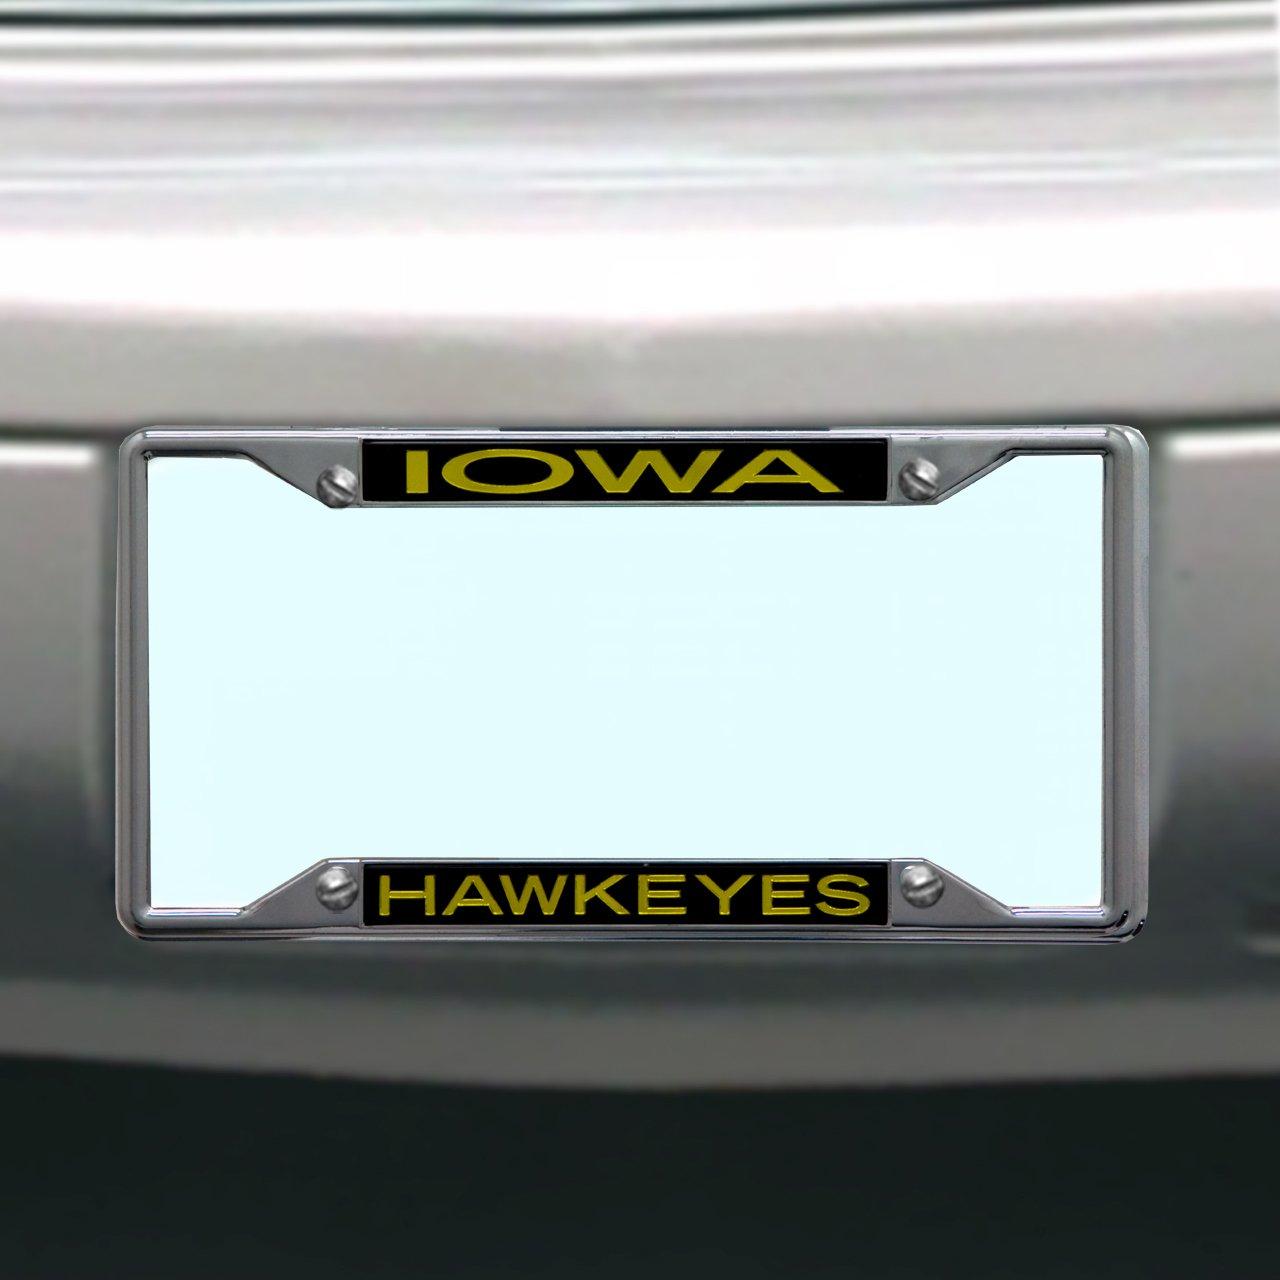 NCAA Iowa Hawkeyes License Plate Frame Wincraft S84976